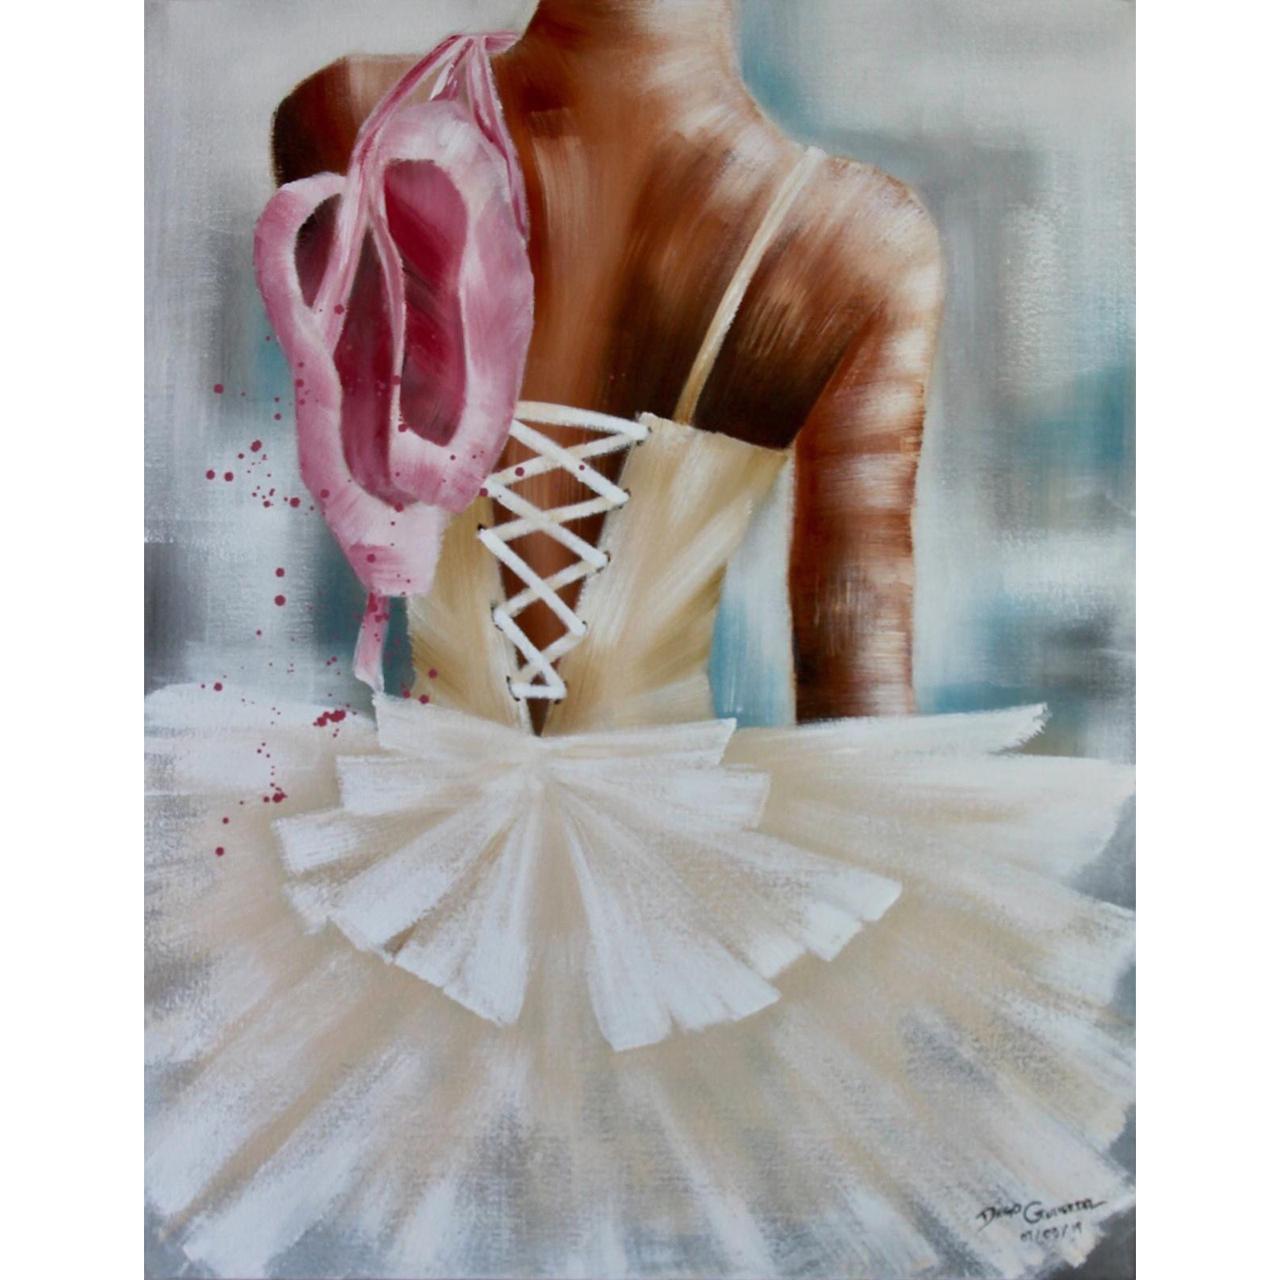 diego-gutierrez-gallery-ballerina-back-04